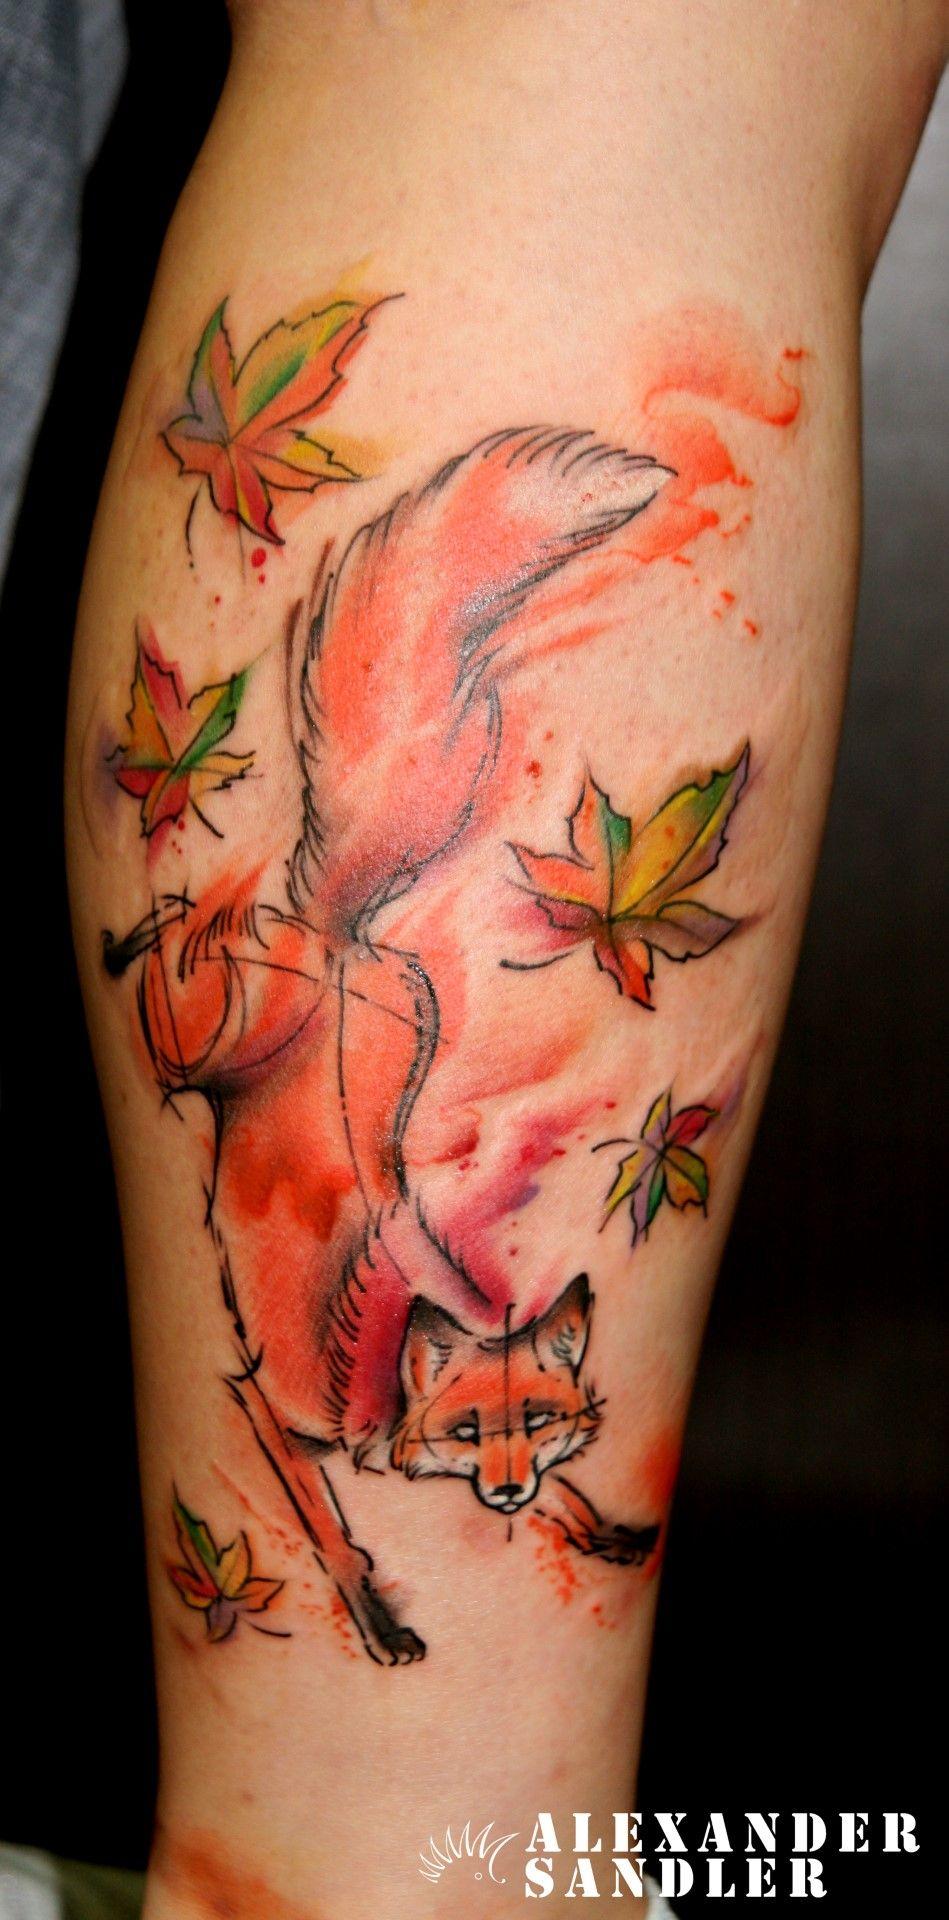 Kipod Studio Alexander Sandler Tattoo designs, Tattoos